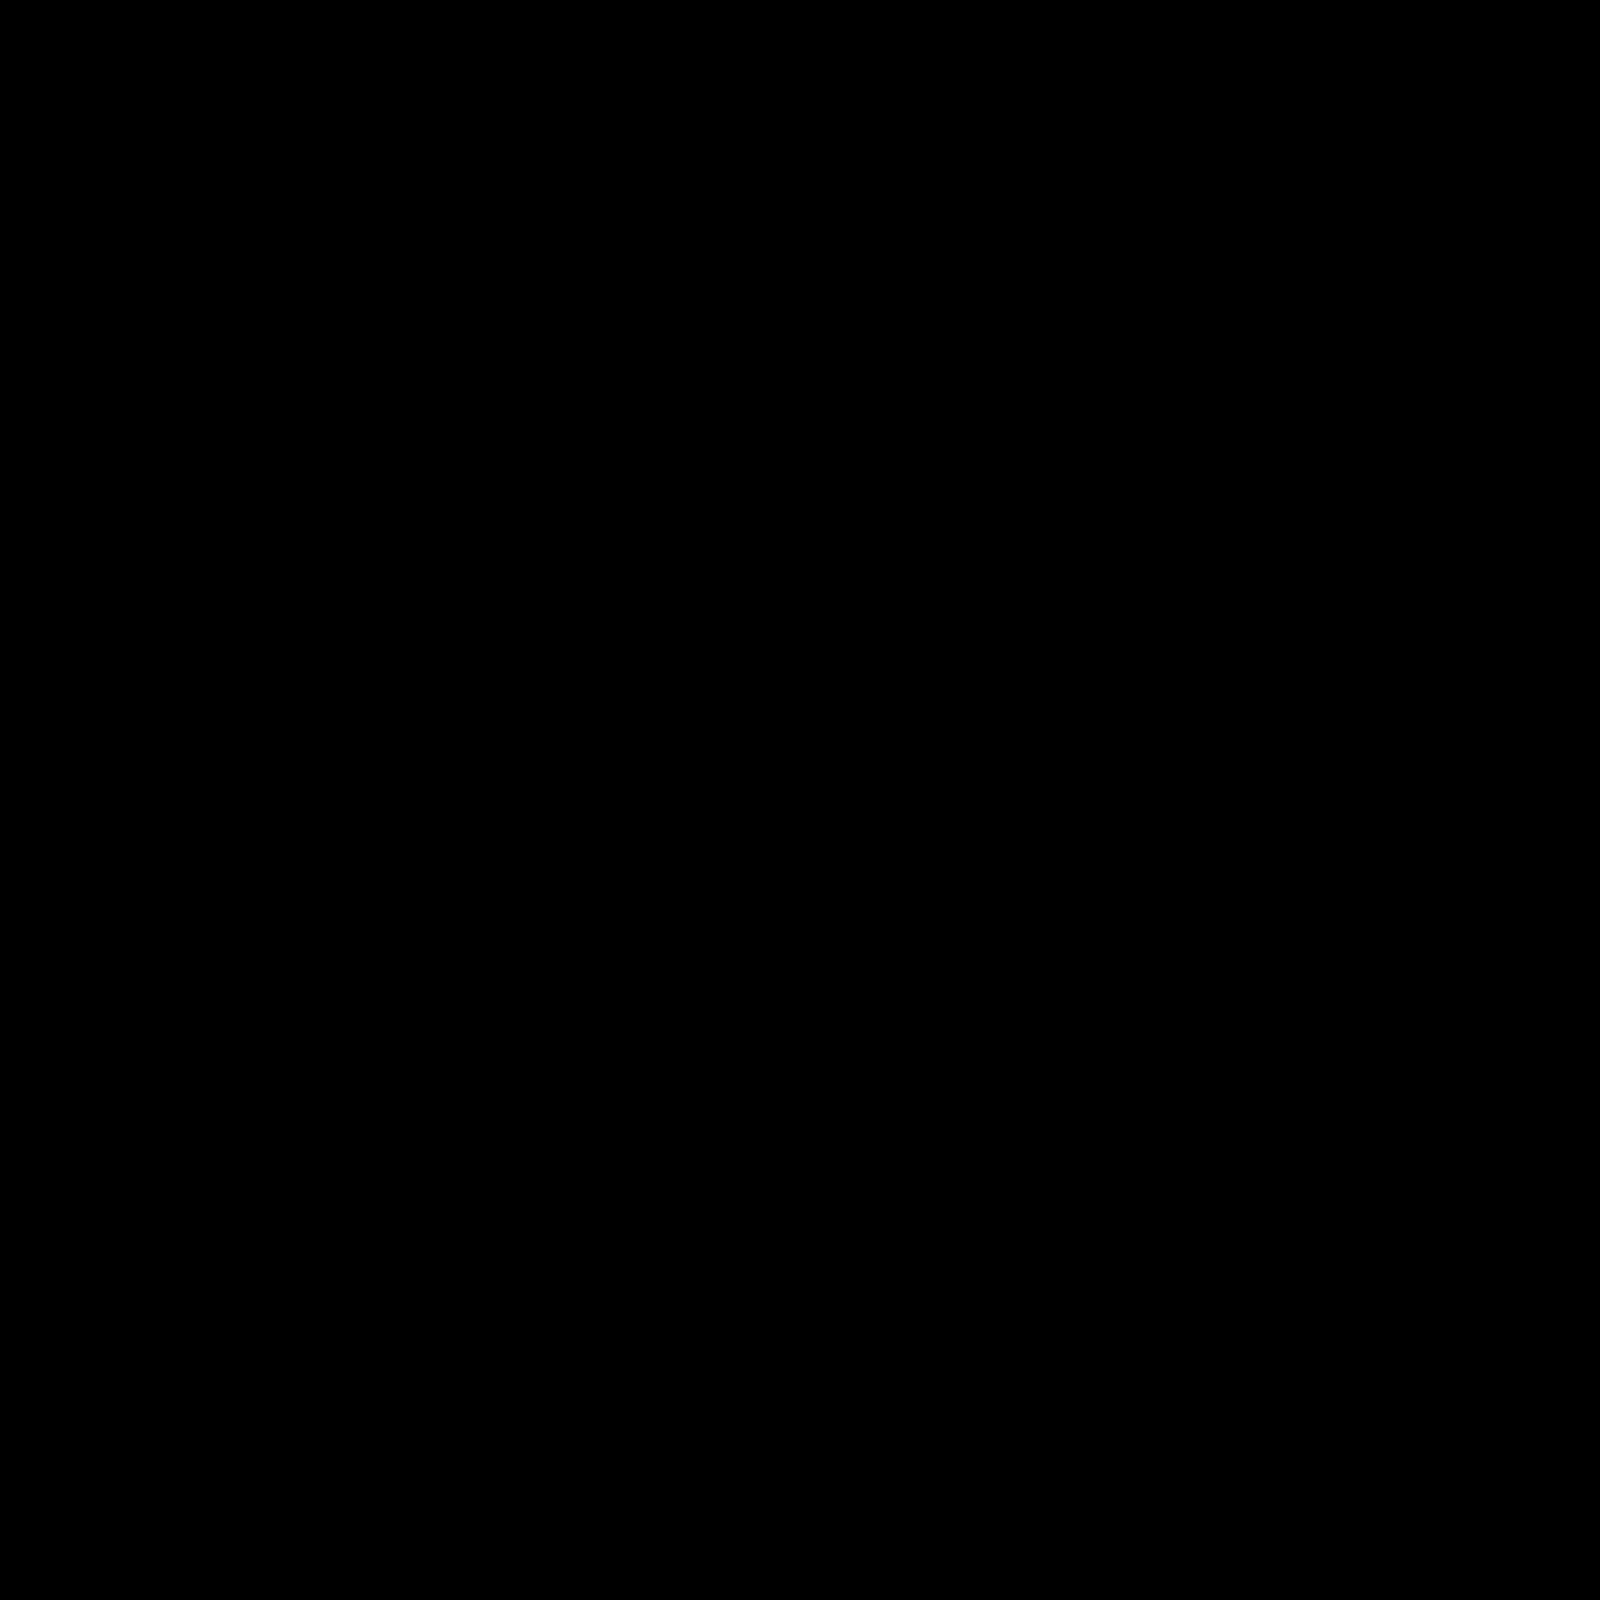 Баскетбольная площадка icon